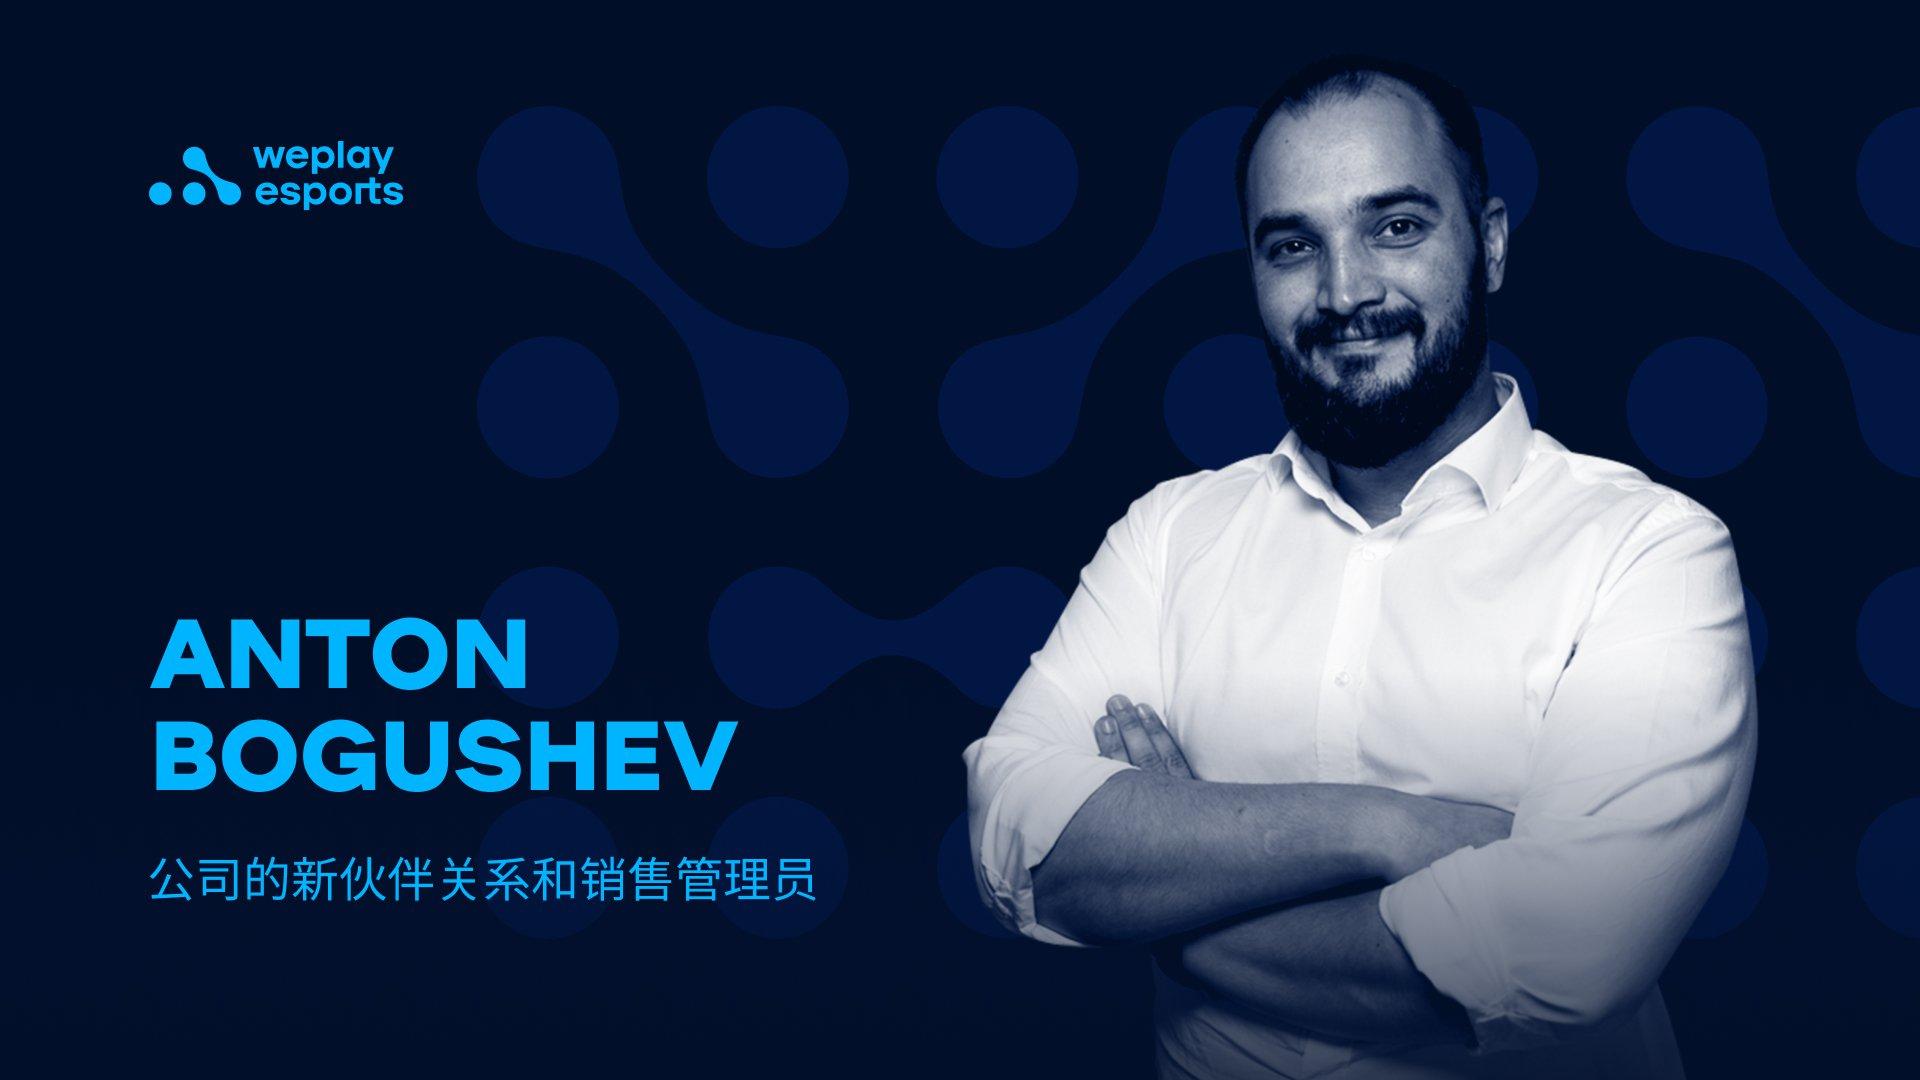 Anton Bogushev 是 WePlay Holding公司的新伙伴关系和销售管理员